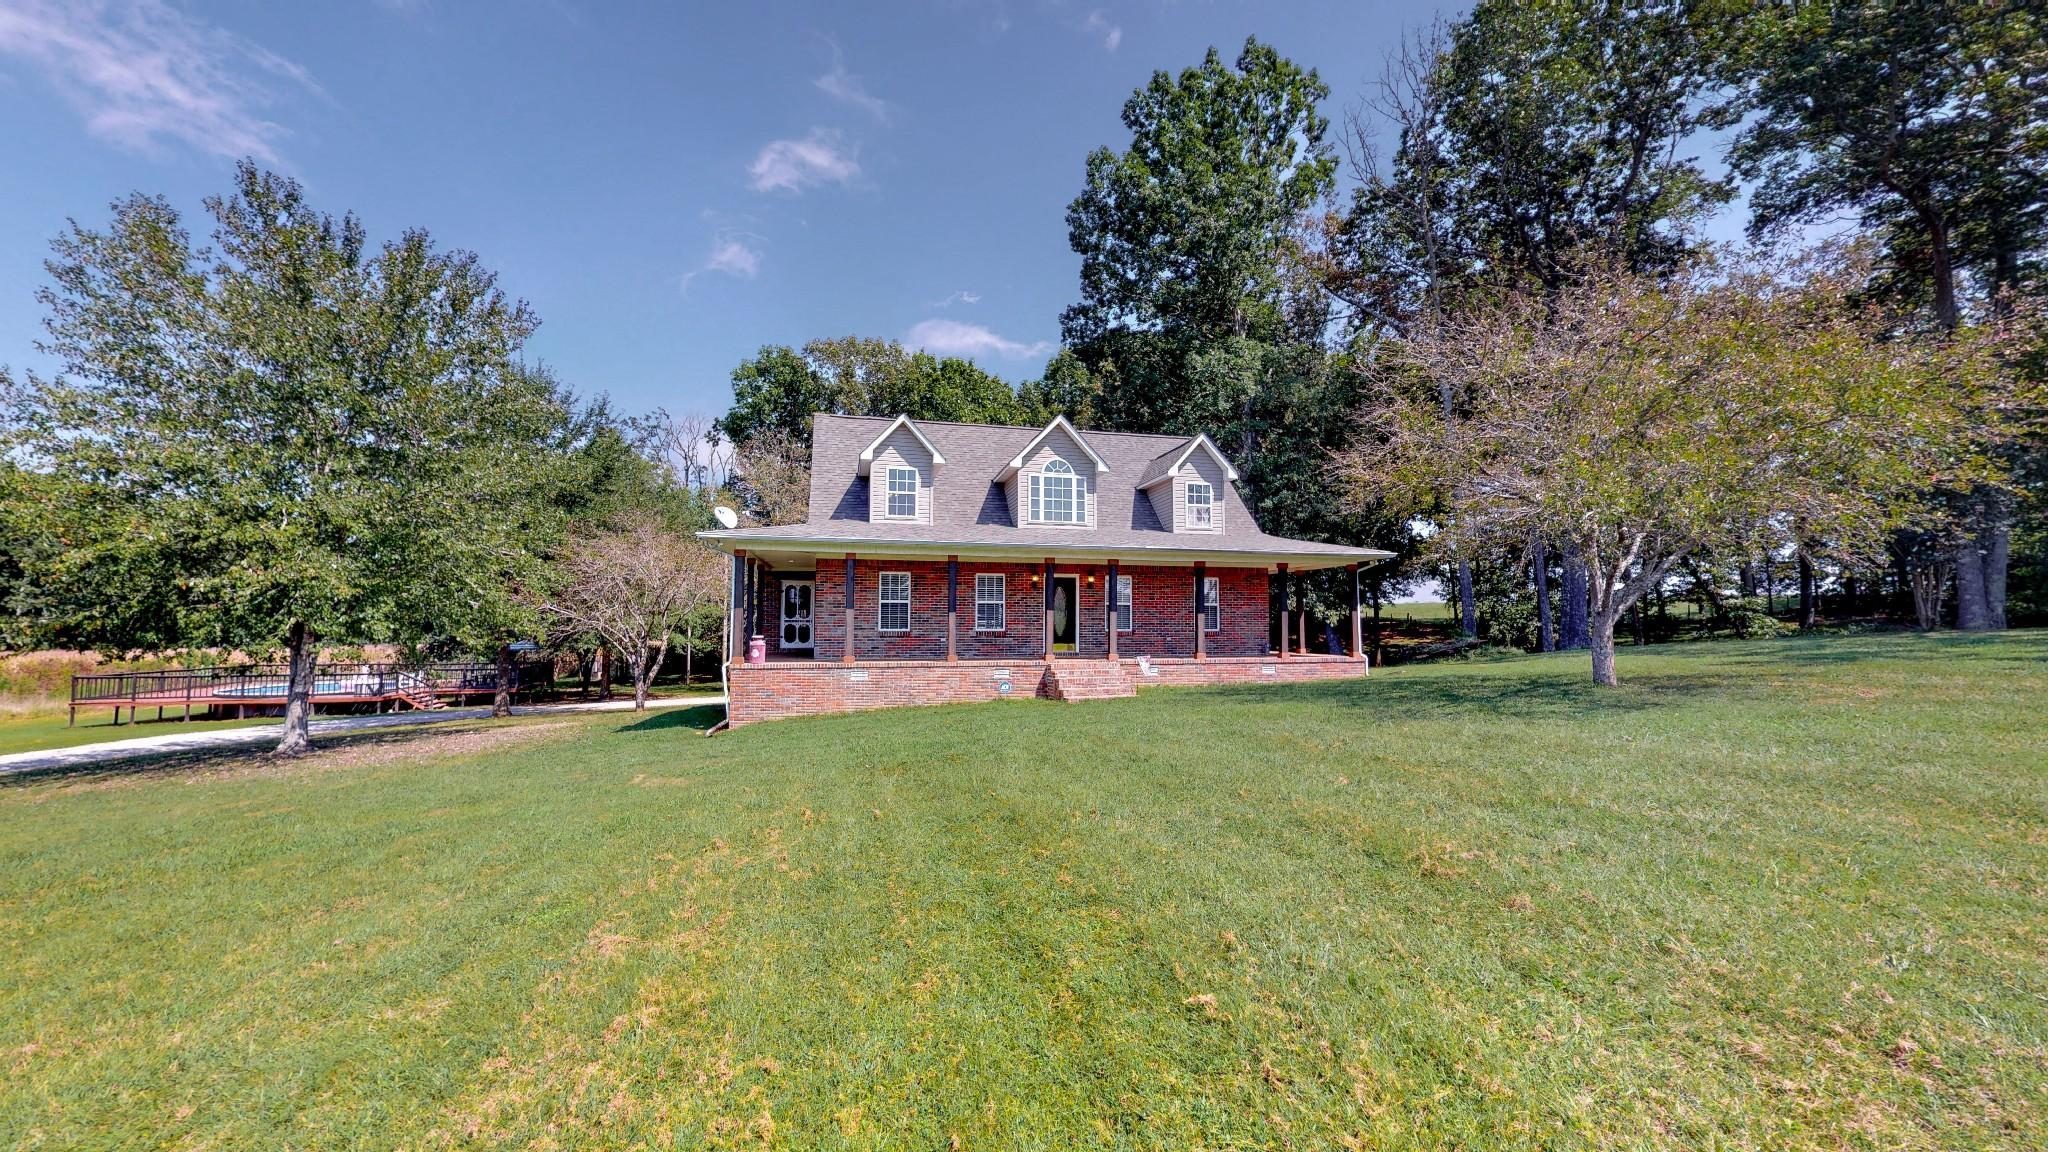 42 Stephenson Rd, Summertown, TN 38483 - Summertown, TN real estate listing